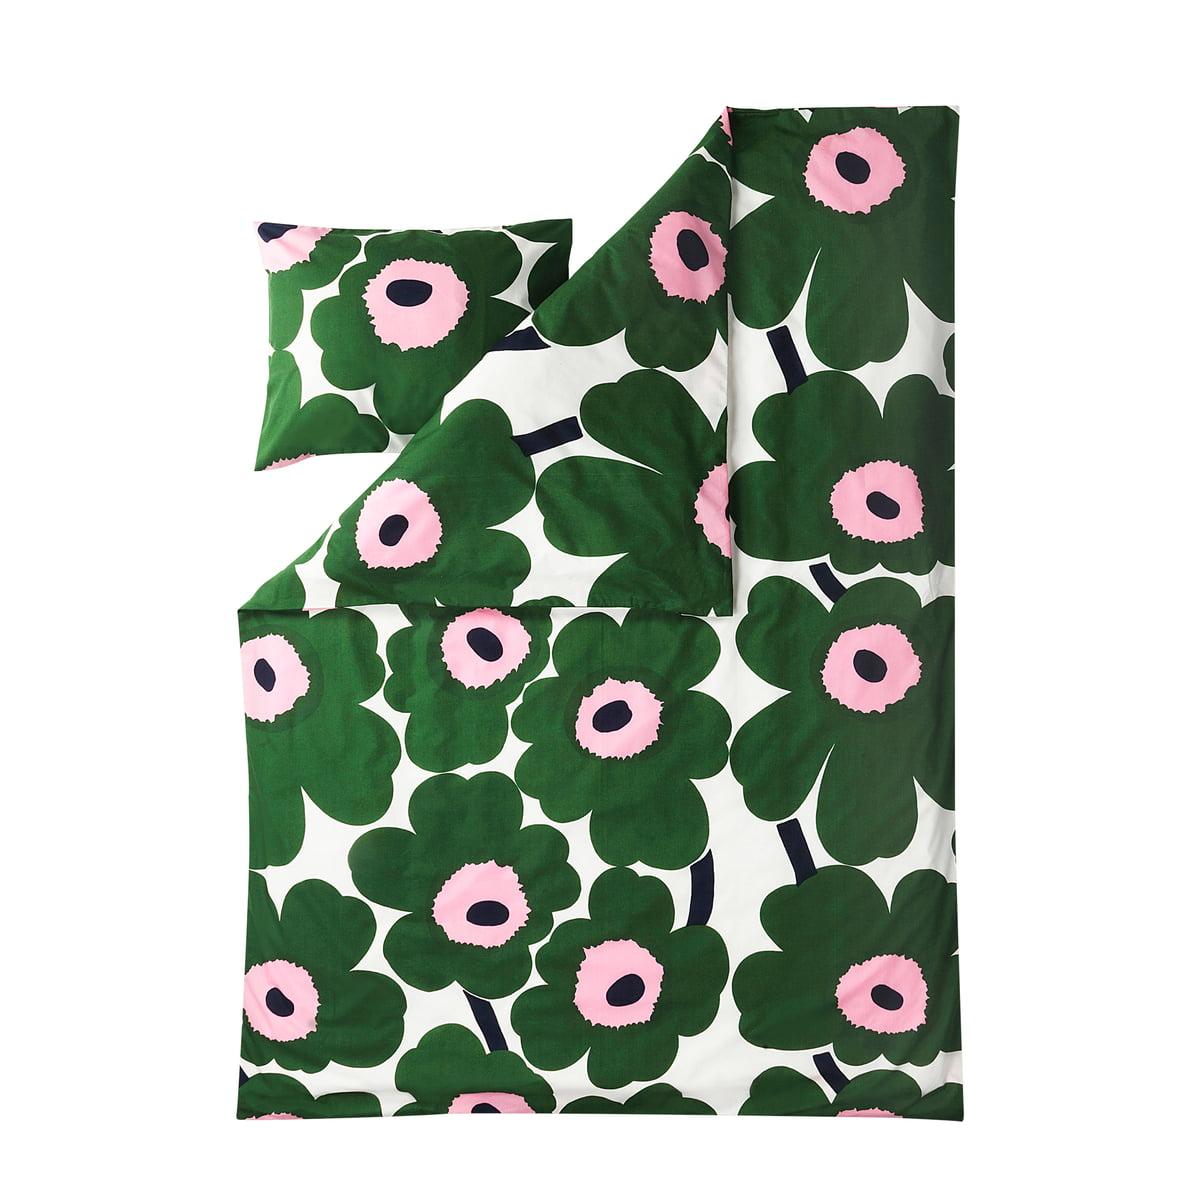 Unikko Pillow Case By Marimekko In The Shop